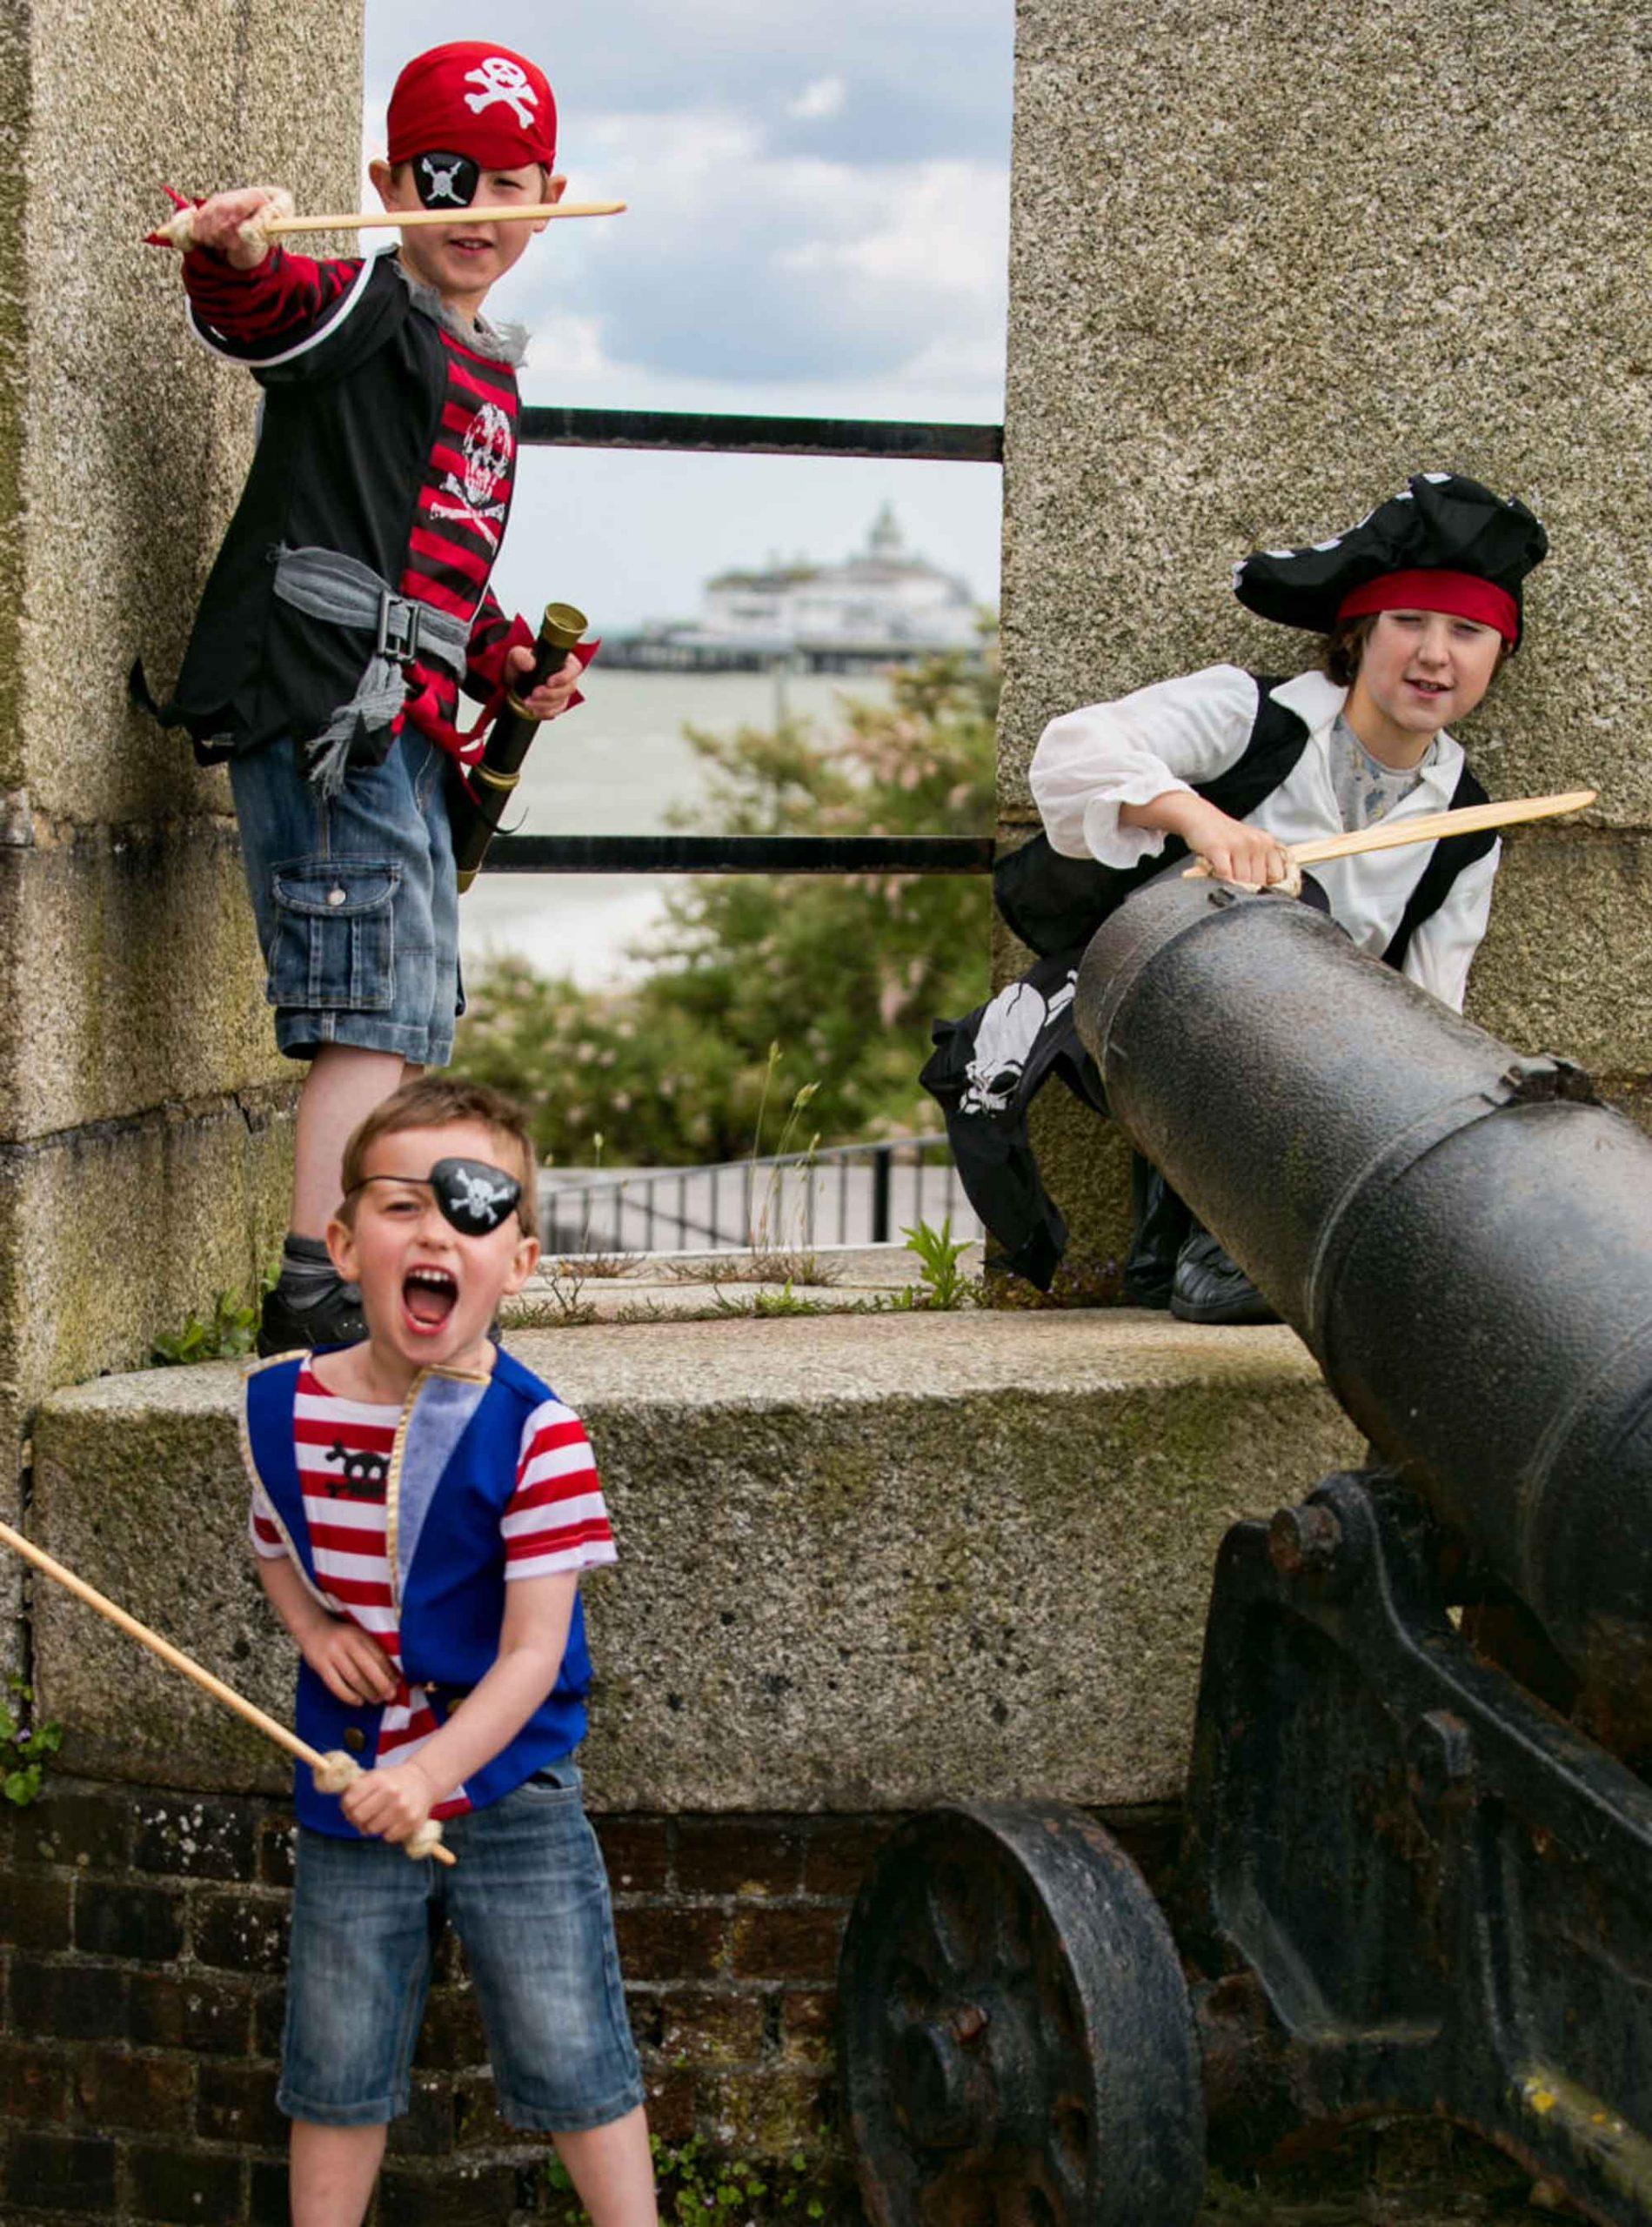 Pirates photo